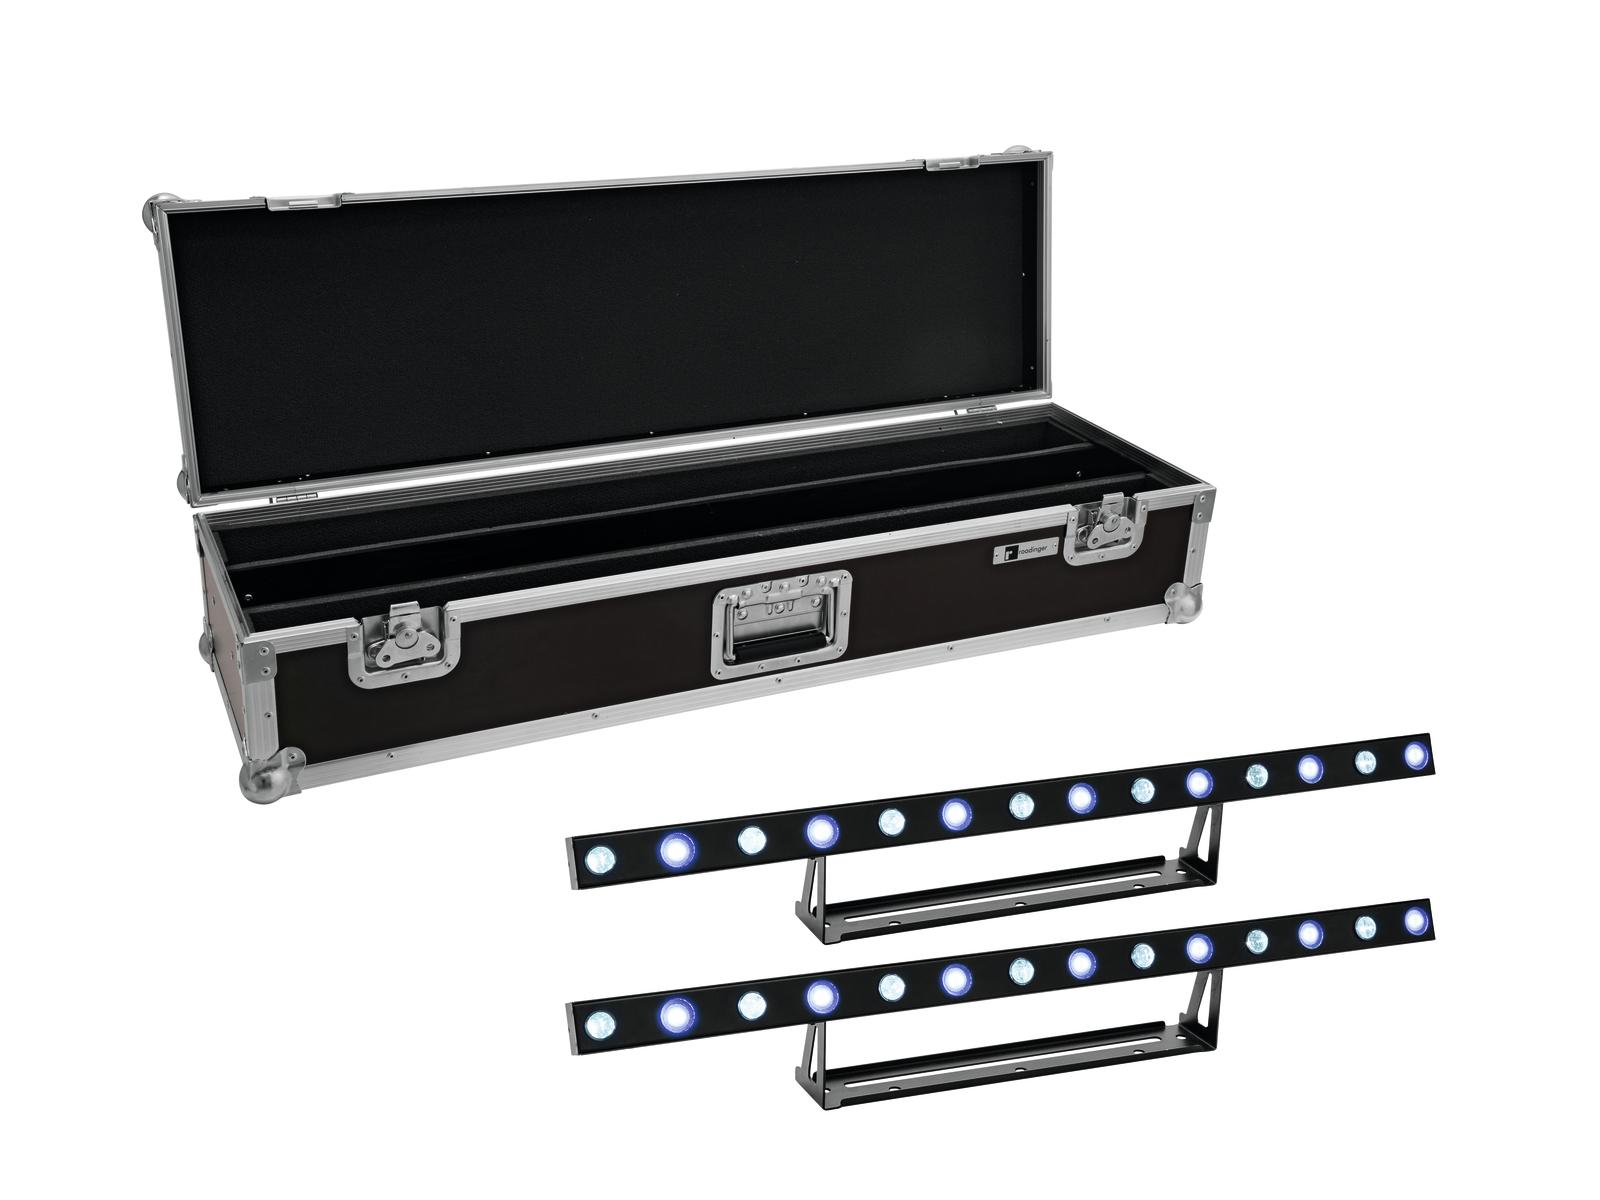 eurolite-set-2x-led-stp-7-beam-wash-bar-case